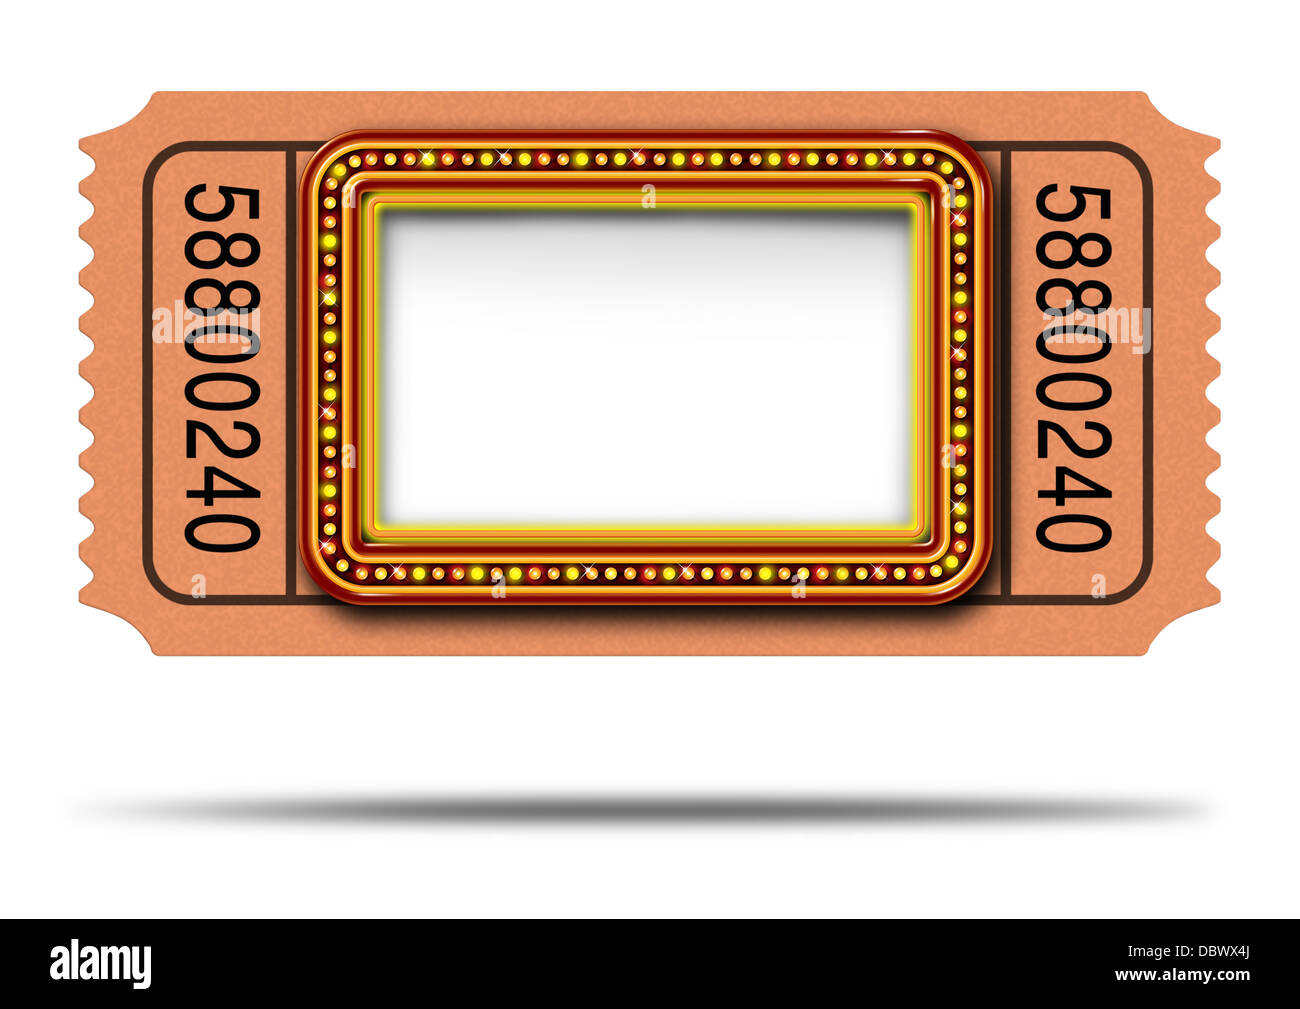 Charmant Marquee Rahmen Galerie - Rahmen Ideen - markjohnsonshow.info